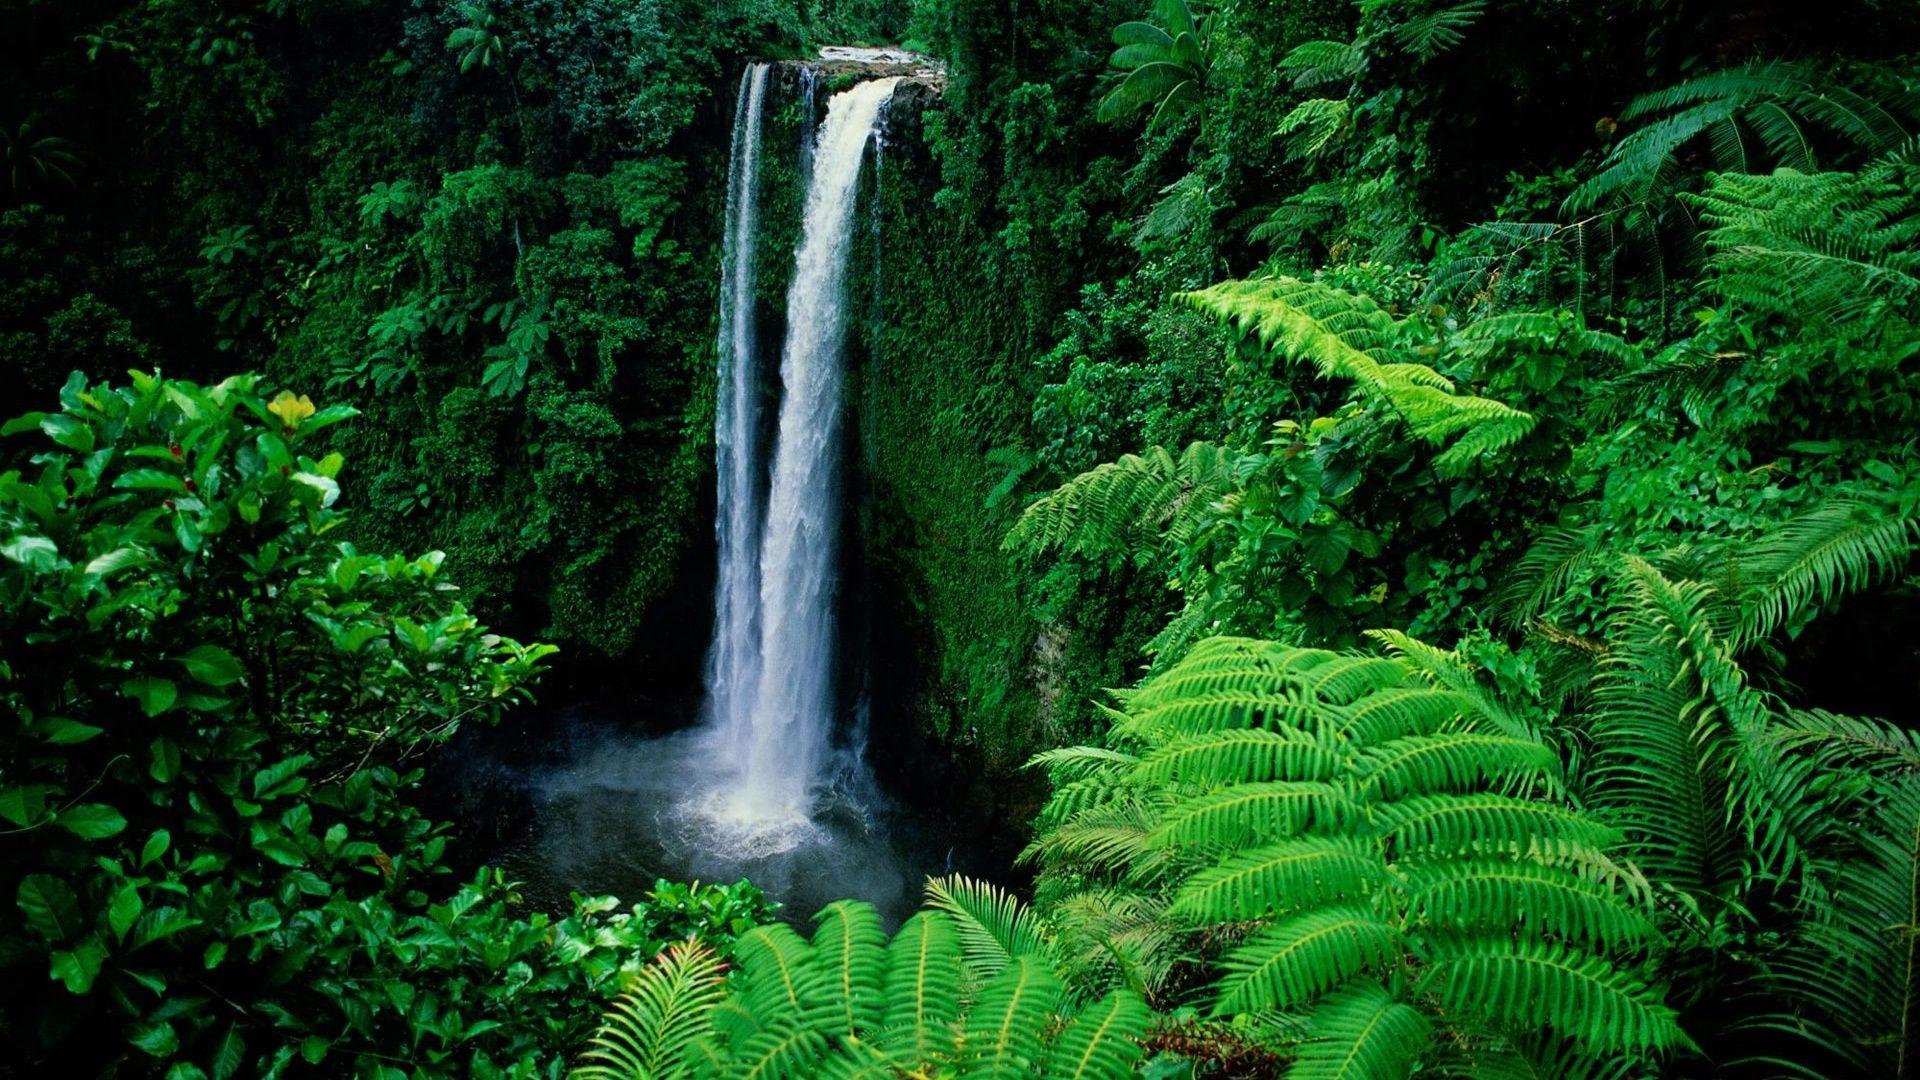 Relaxing For Eyes Waterfall Wallpaper Waterfall Green Nature